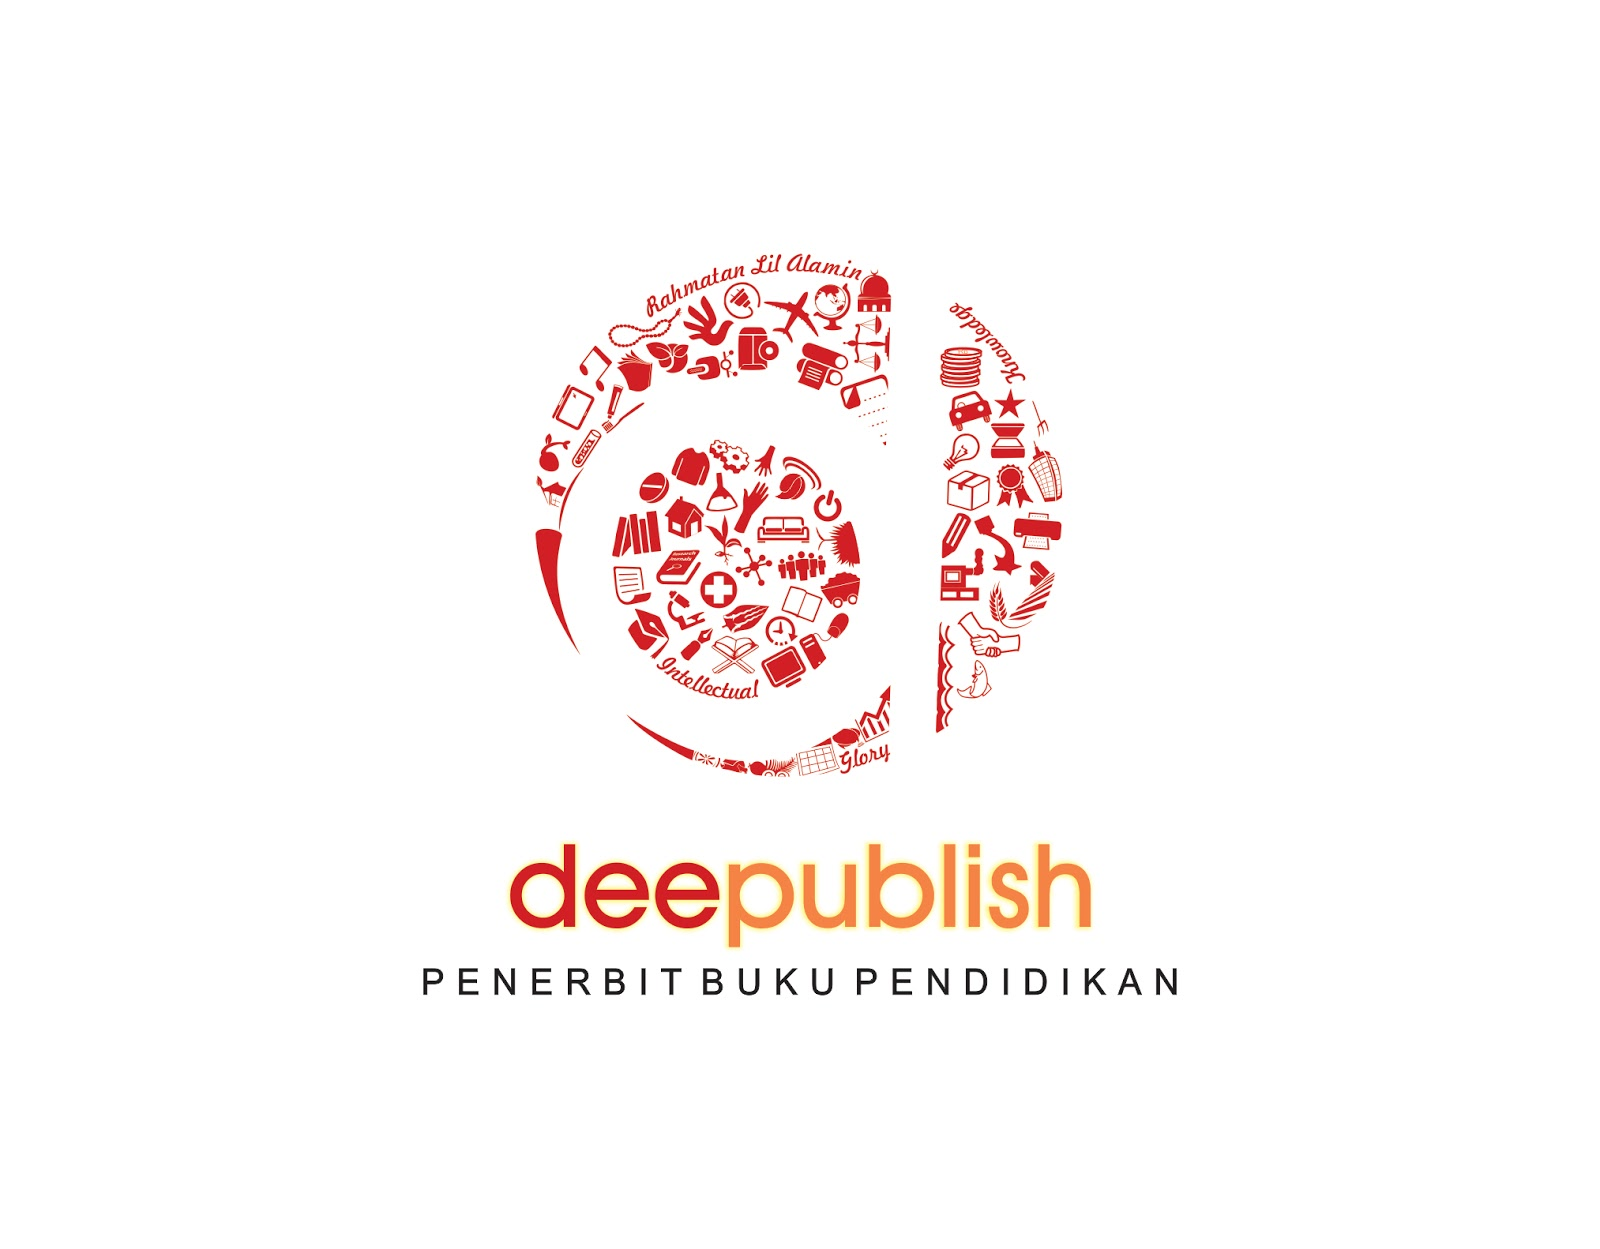 Kerja Part Time Di Jogja Portal Info Lowongan Kerja Di Yogyakarta Terbaru 2016 Lowongan Staff Part Time Internet Marketing Di Penerbit Deepublish